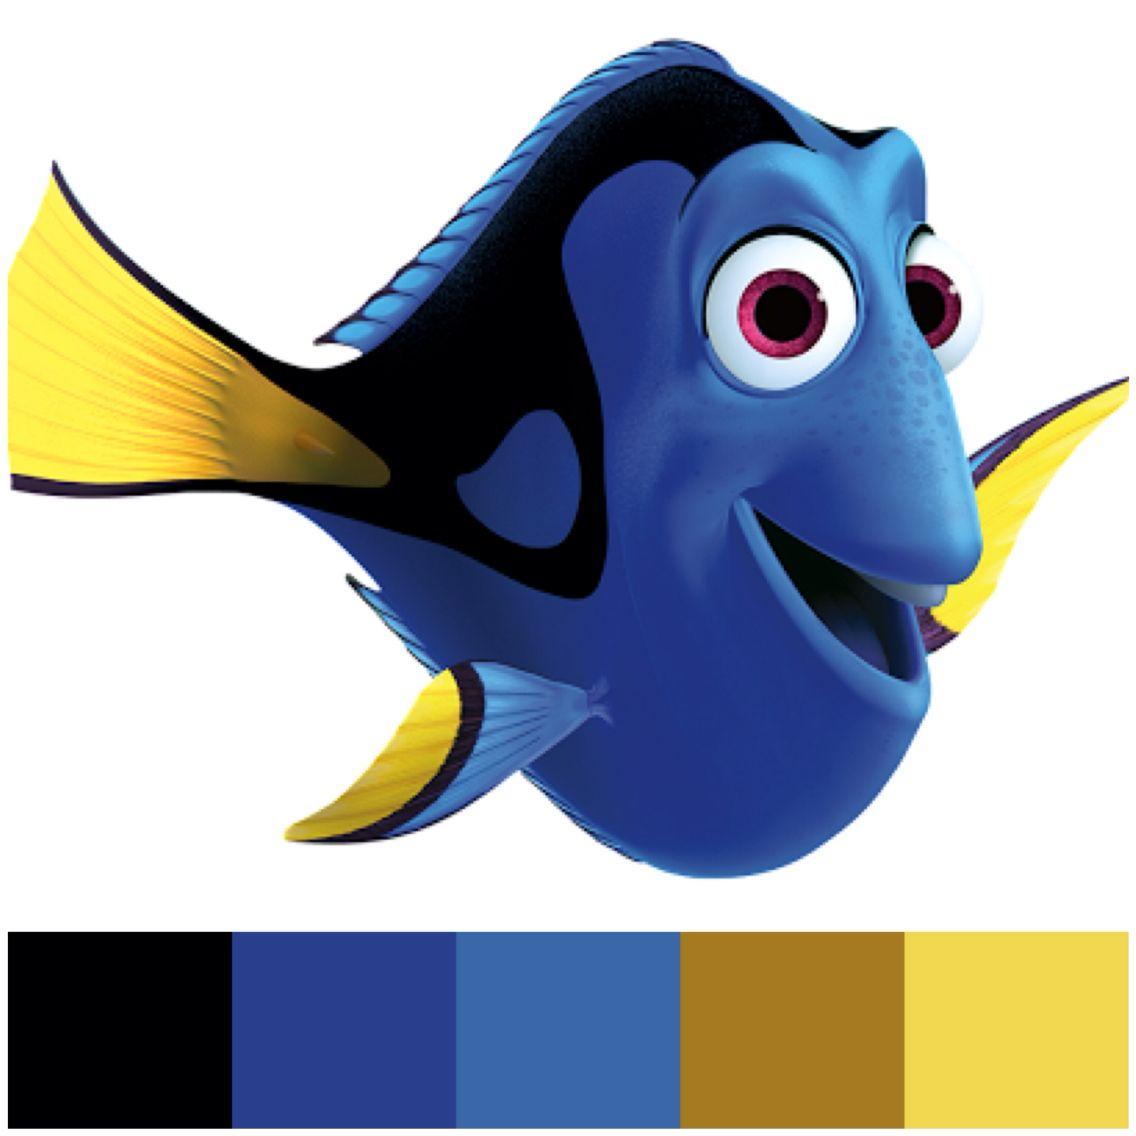 Dory Finding Nemo, Finding Nemo